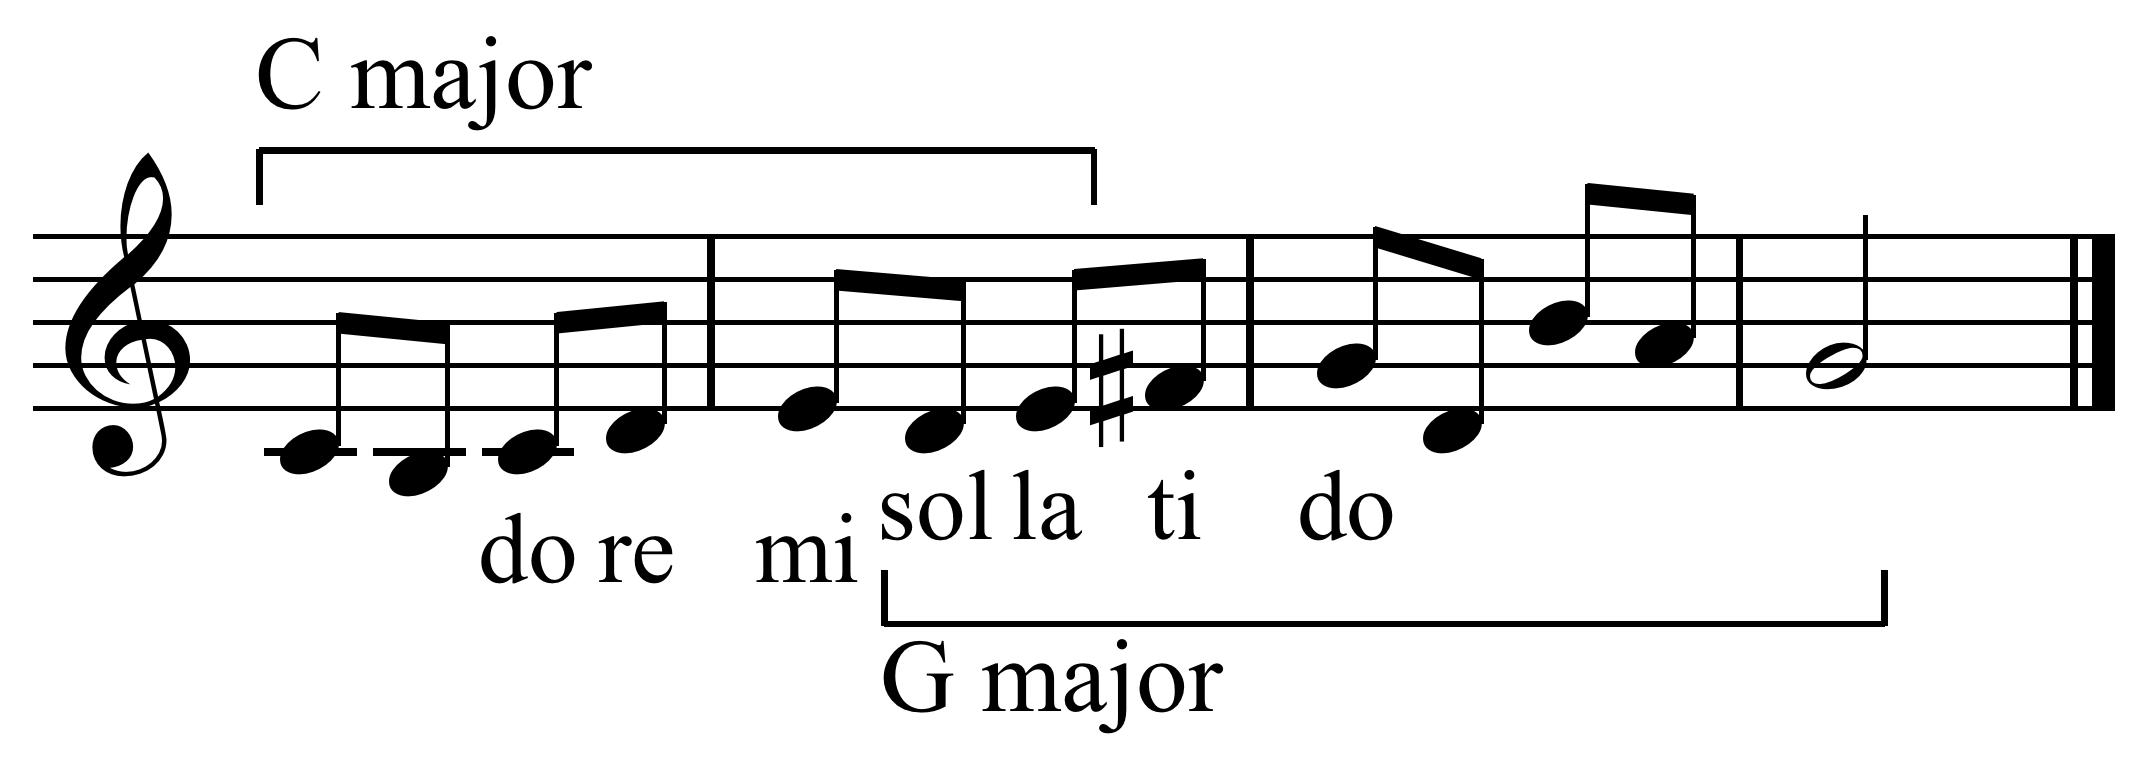 Modulation Music Wikipedia Guitar Chords Diagrams Scales Keys Lookup Charts